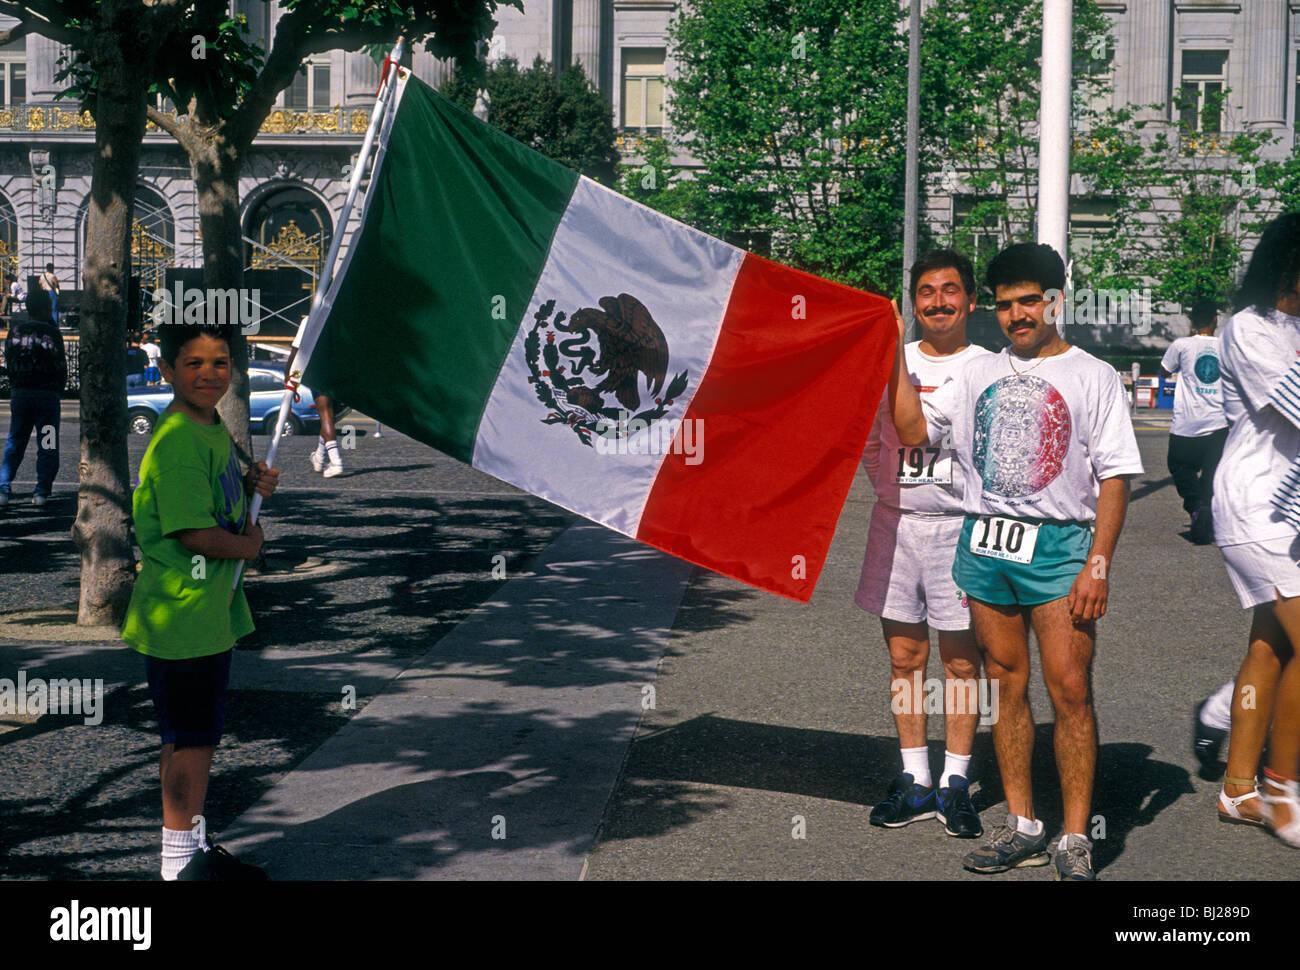 Beste Mexikanische Flagge Färbung Blatt Ideen - Malvorlagen Ideen ...